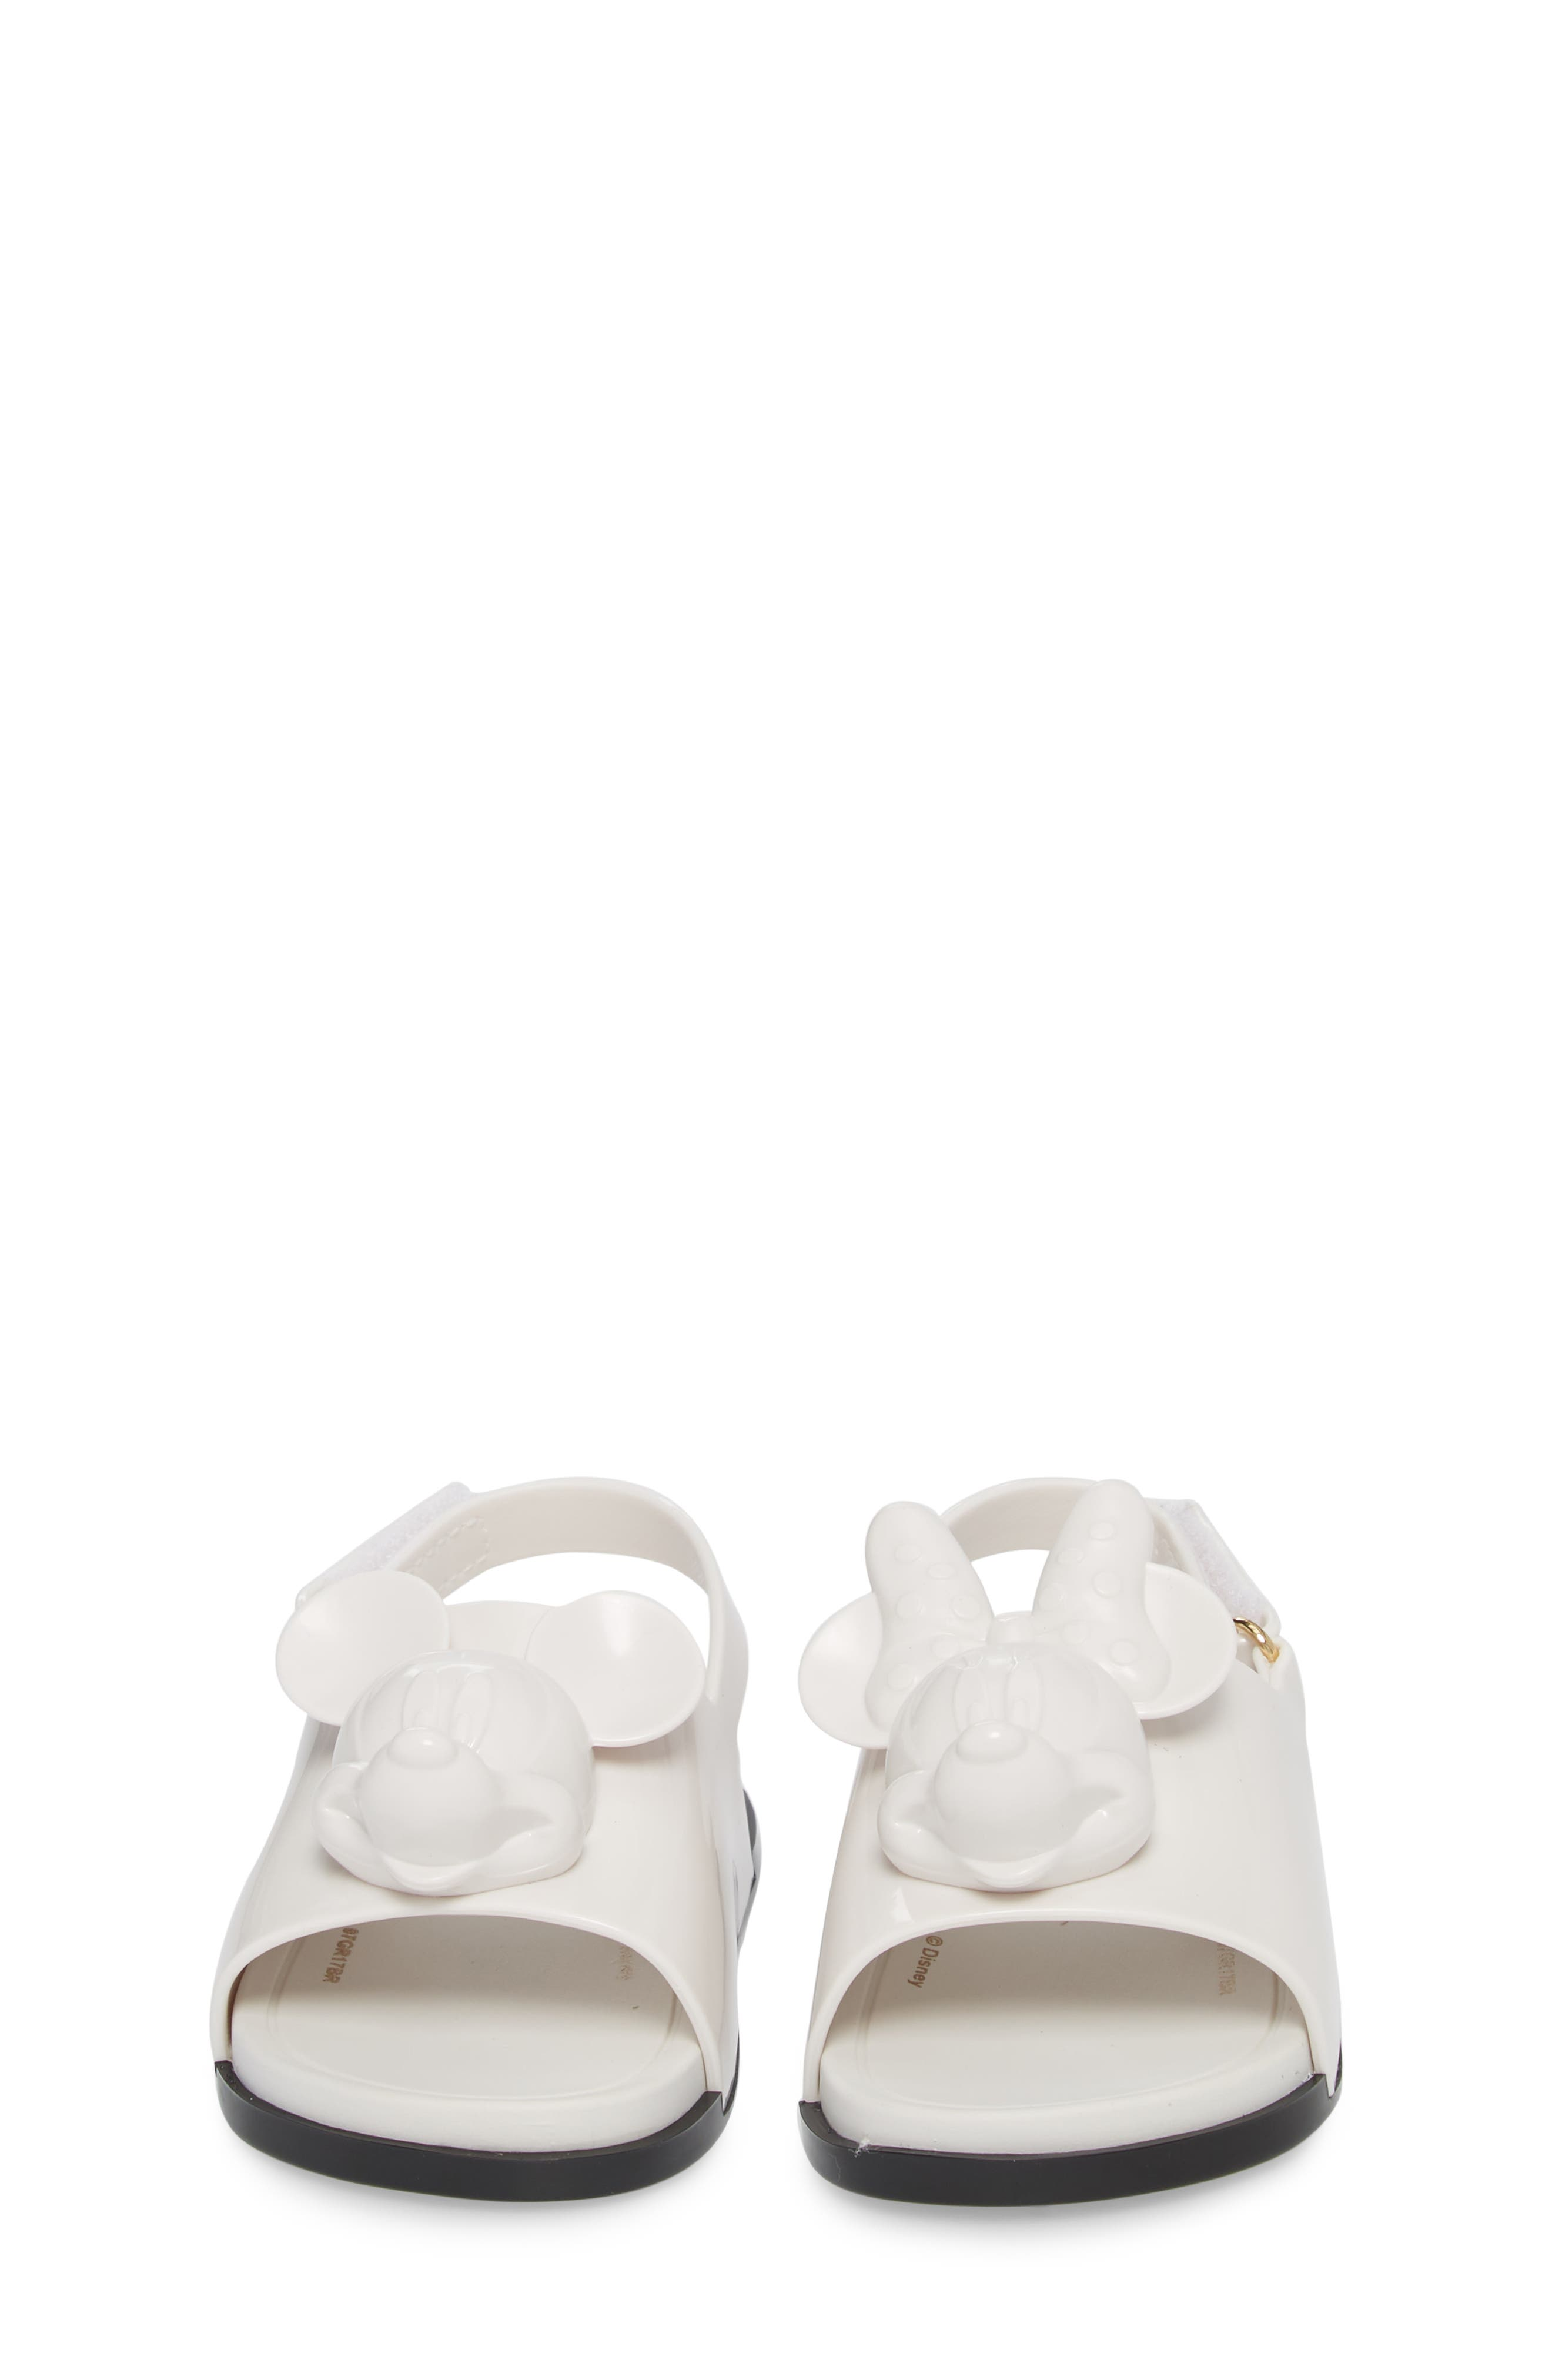 Disney<sup>®</sup> Mini Beach Sandal,                             Alternate thumbnail 18, color,